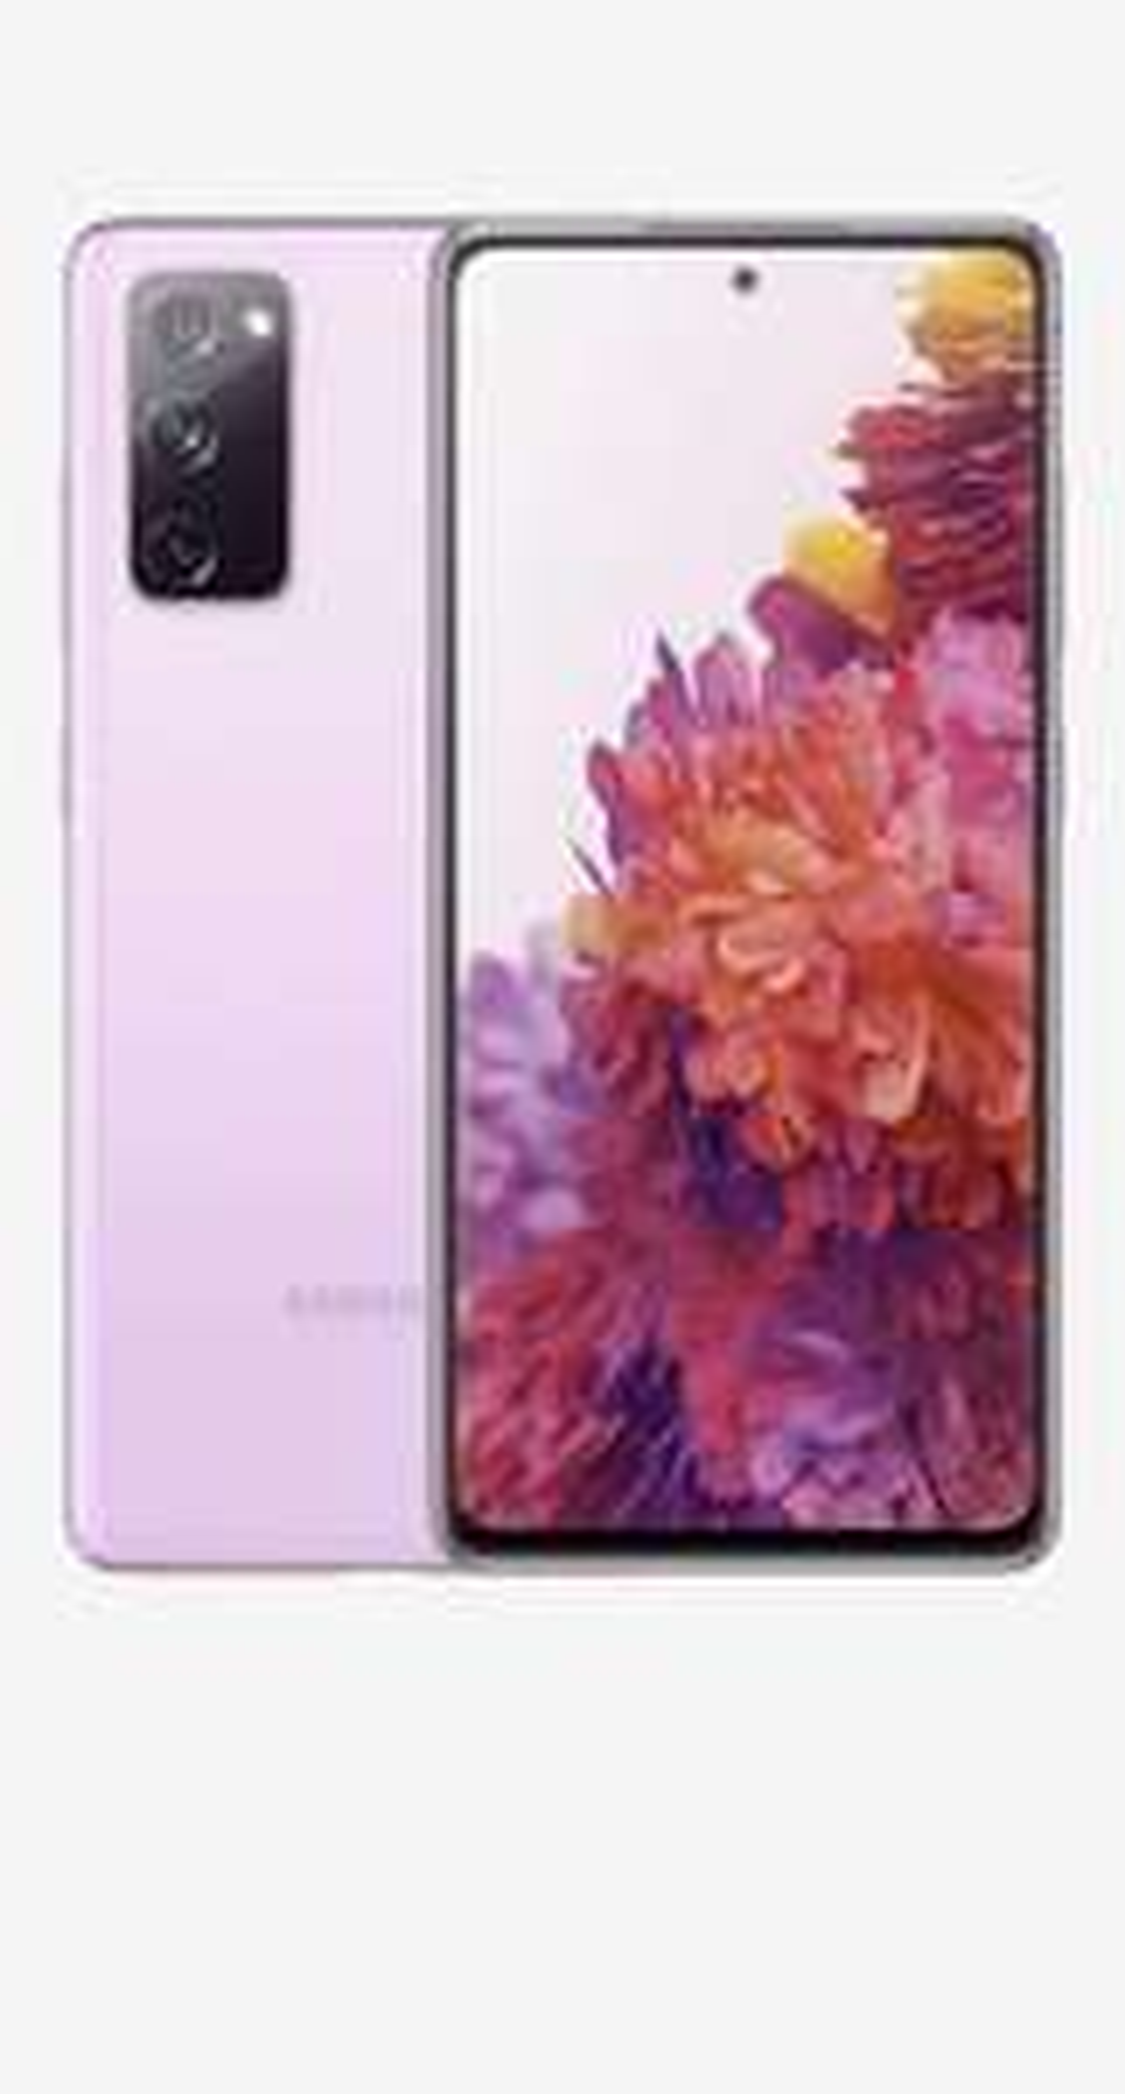 Gratis galaxy buds+ twv €169 bij Samsung Galaxy s20FE